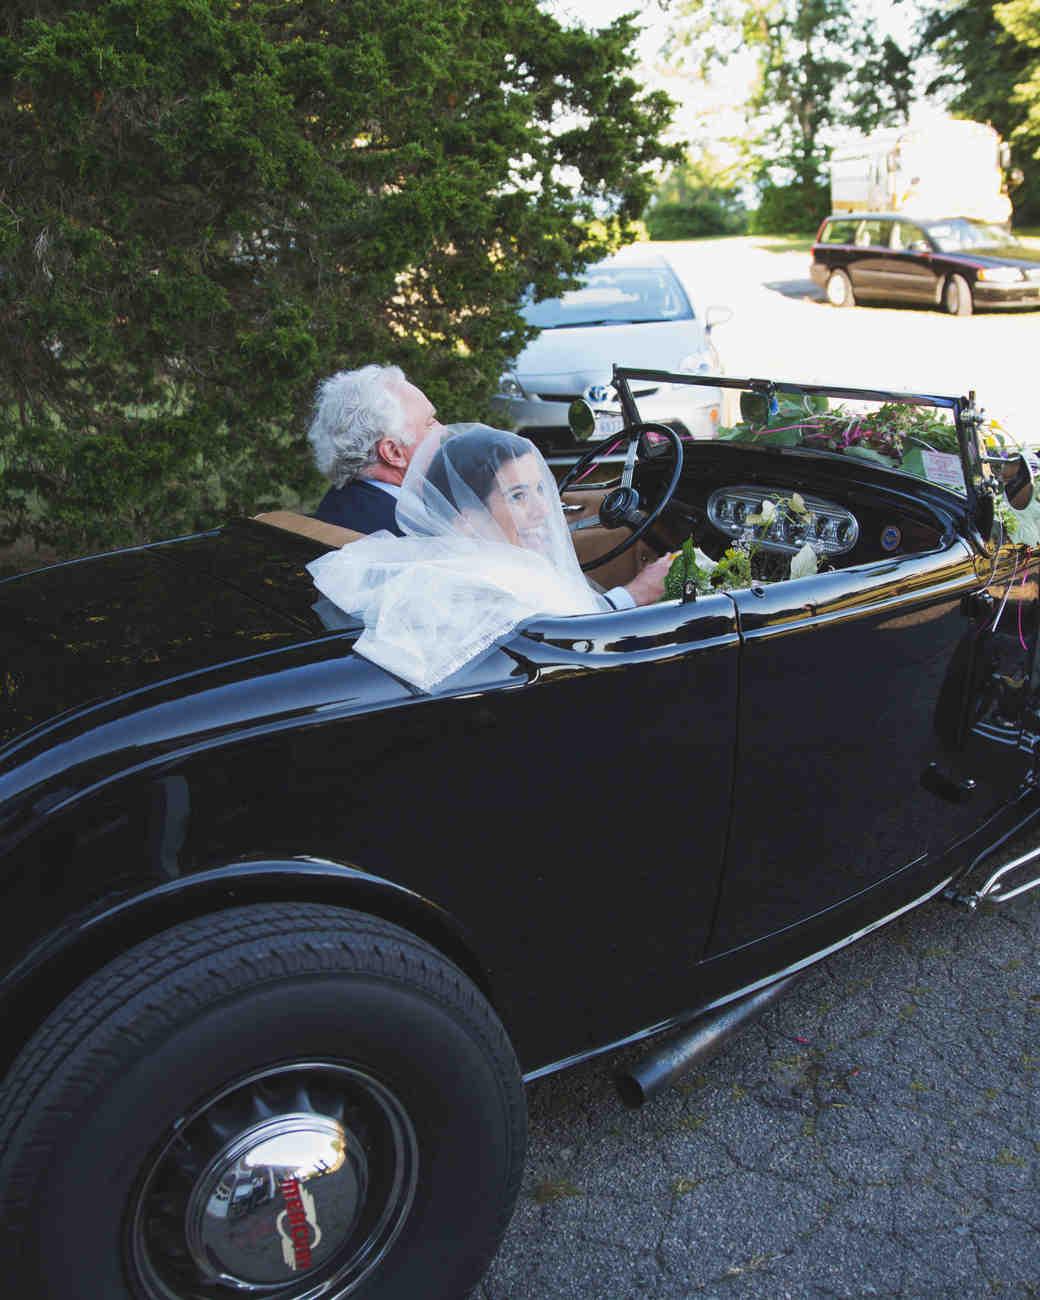 lilly-carter-wedding-car-00288-s112037-0715..jpg